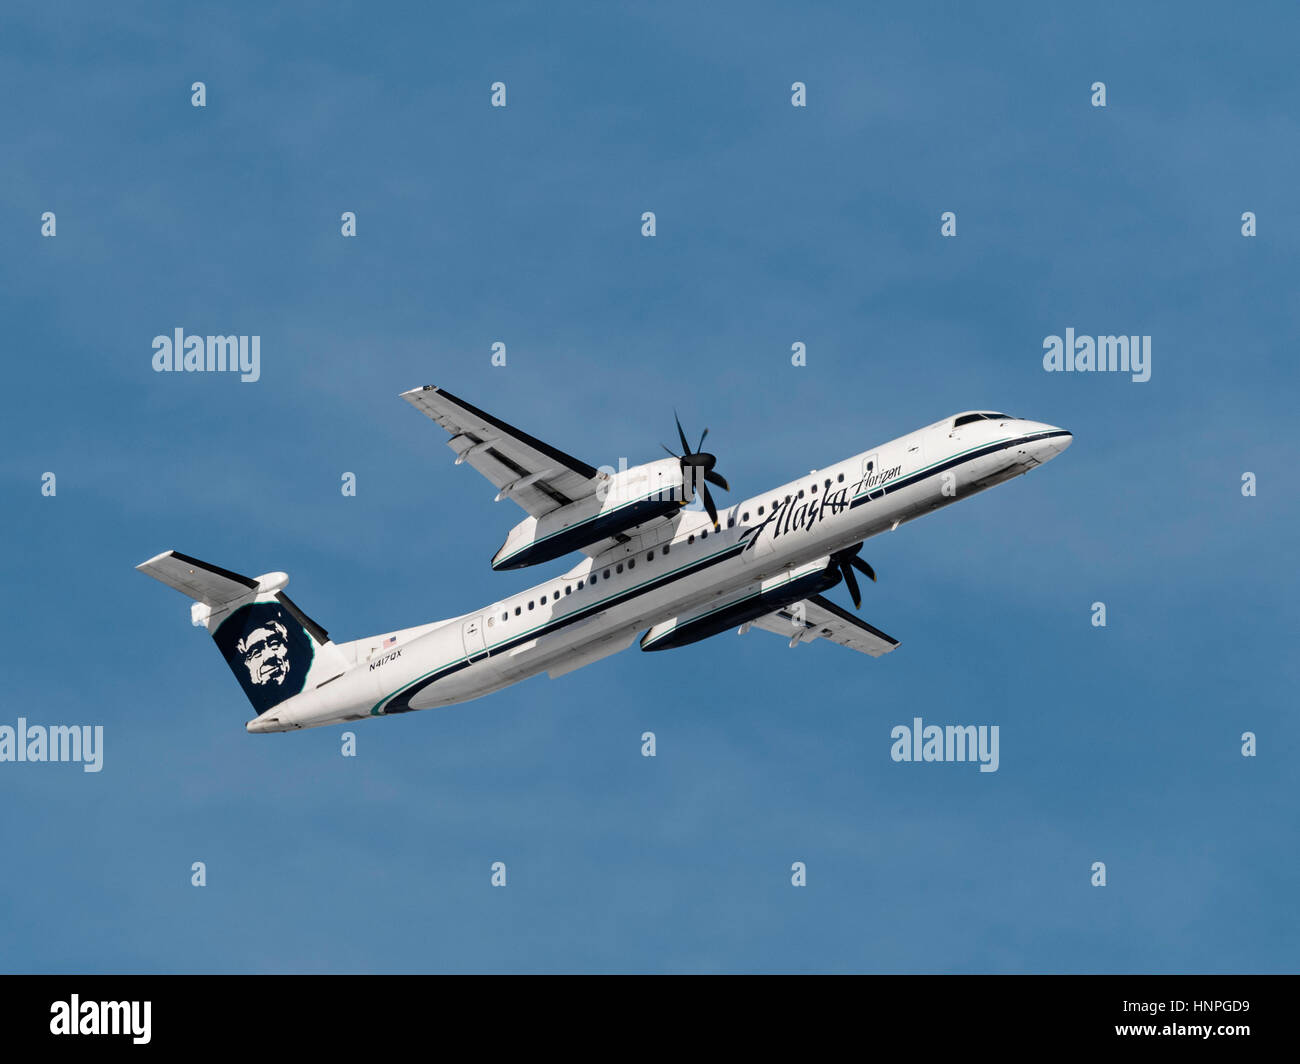 Alaska Airlines Horizon Air Plane Airplane Bombardier